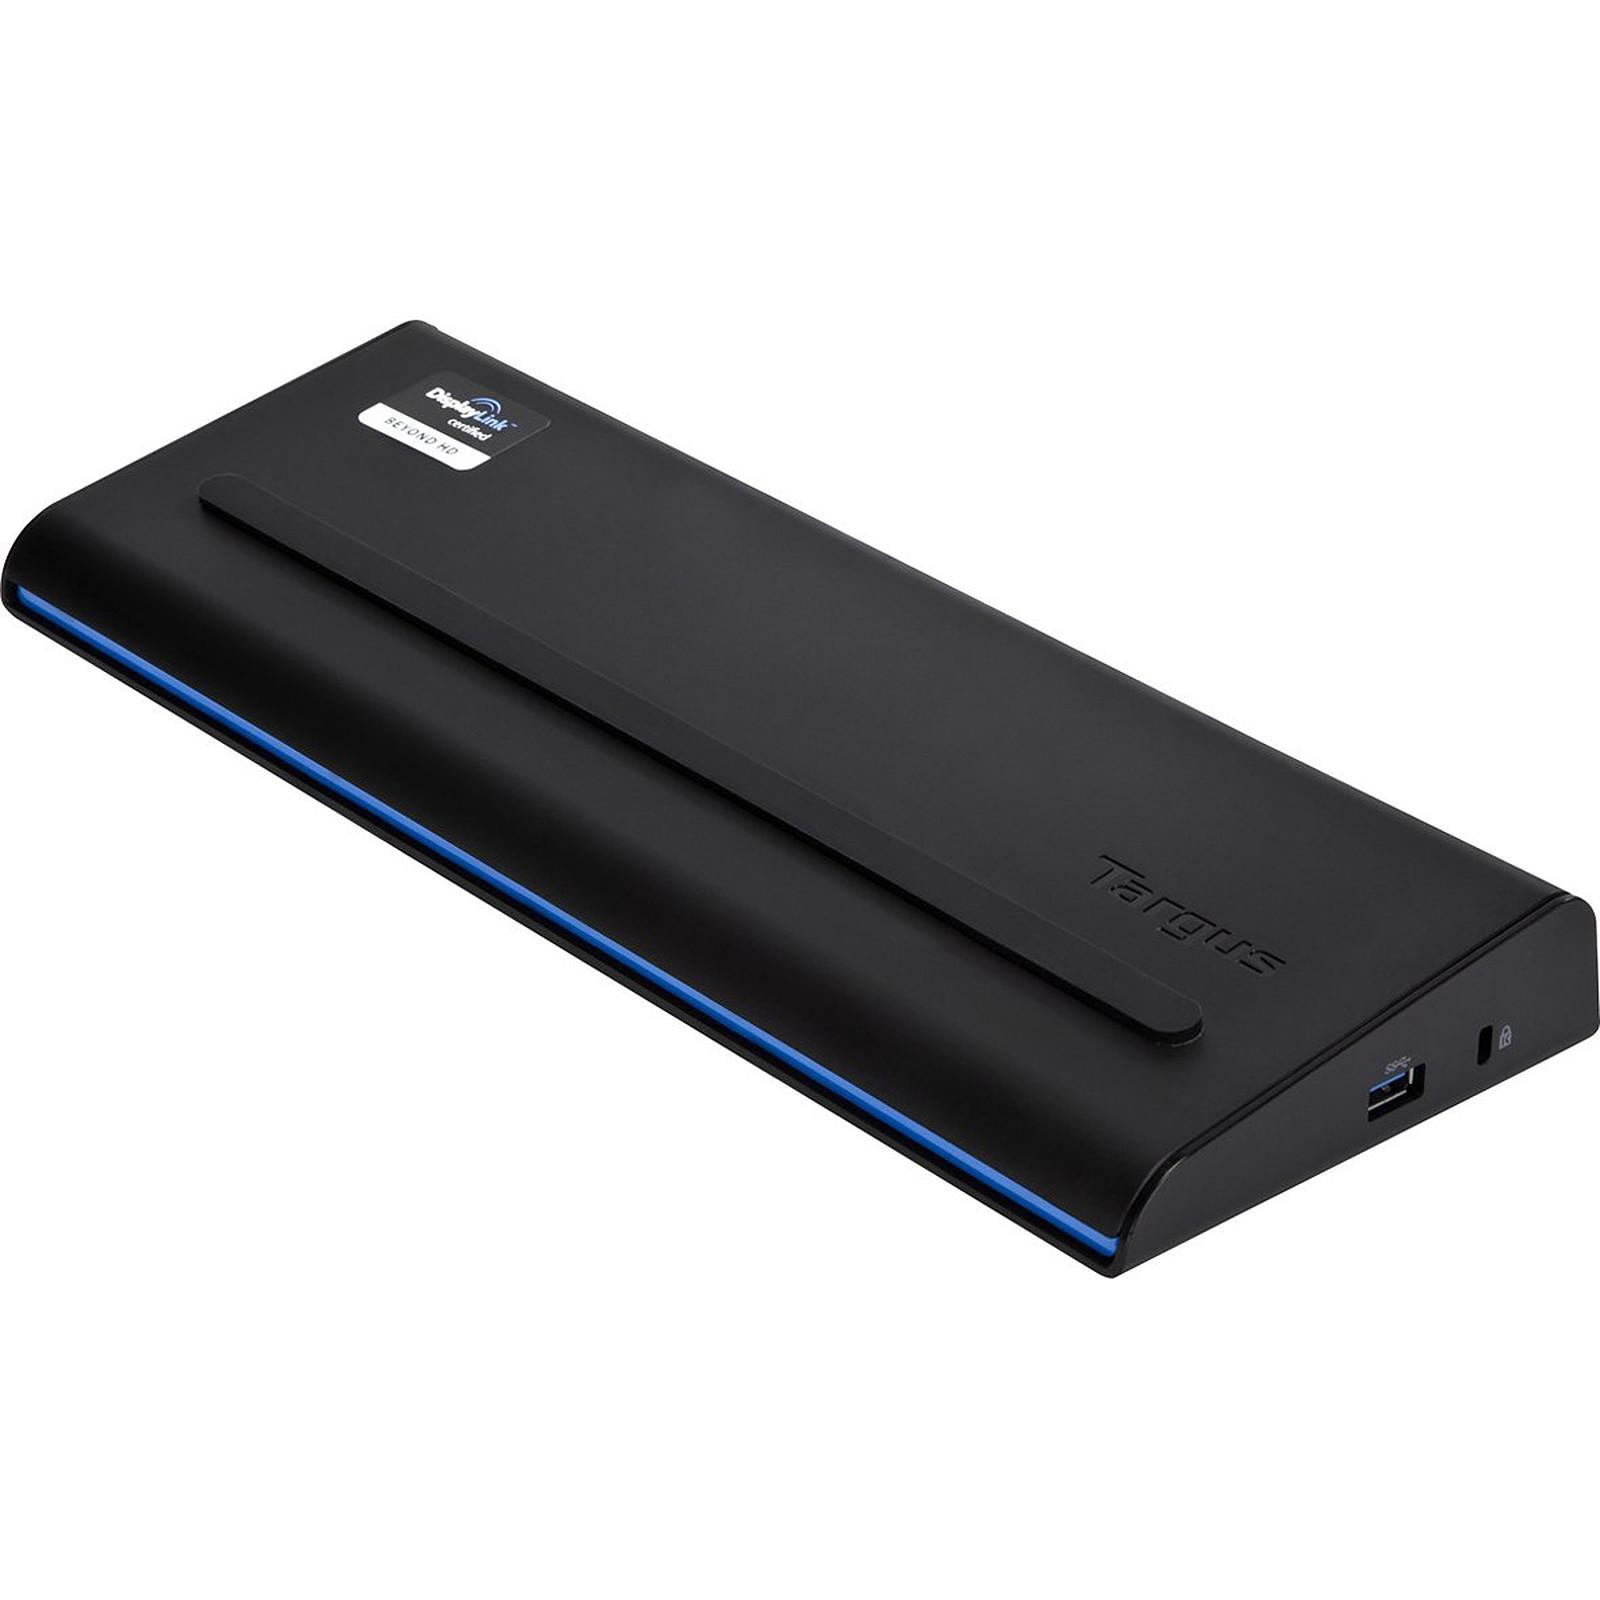 Targus USB 3.0 Dual Video Universal Docking Station with Power